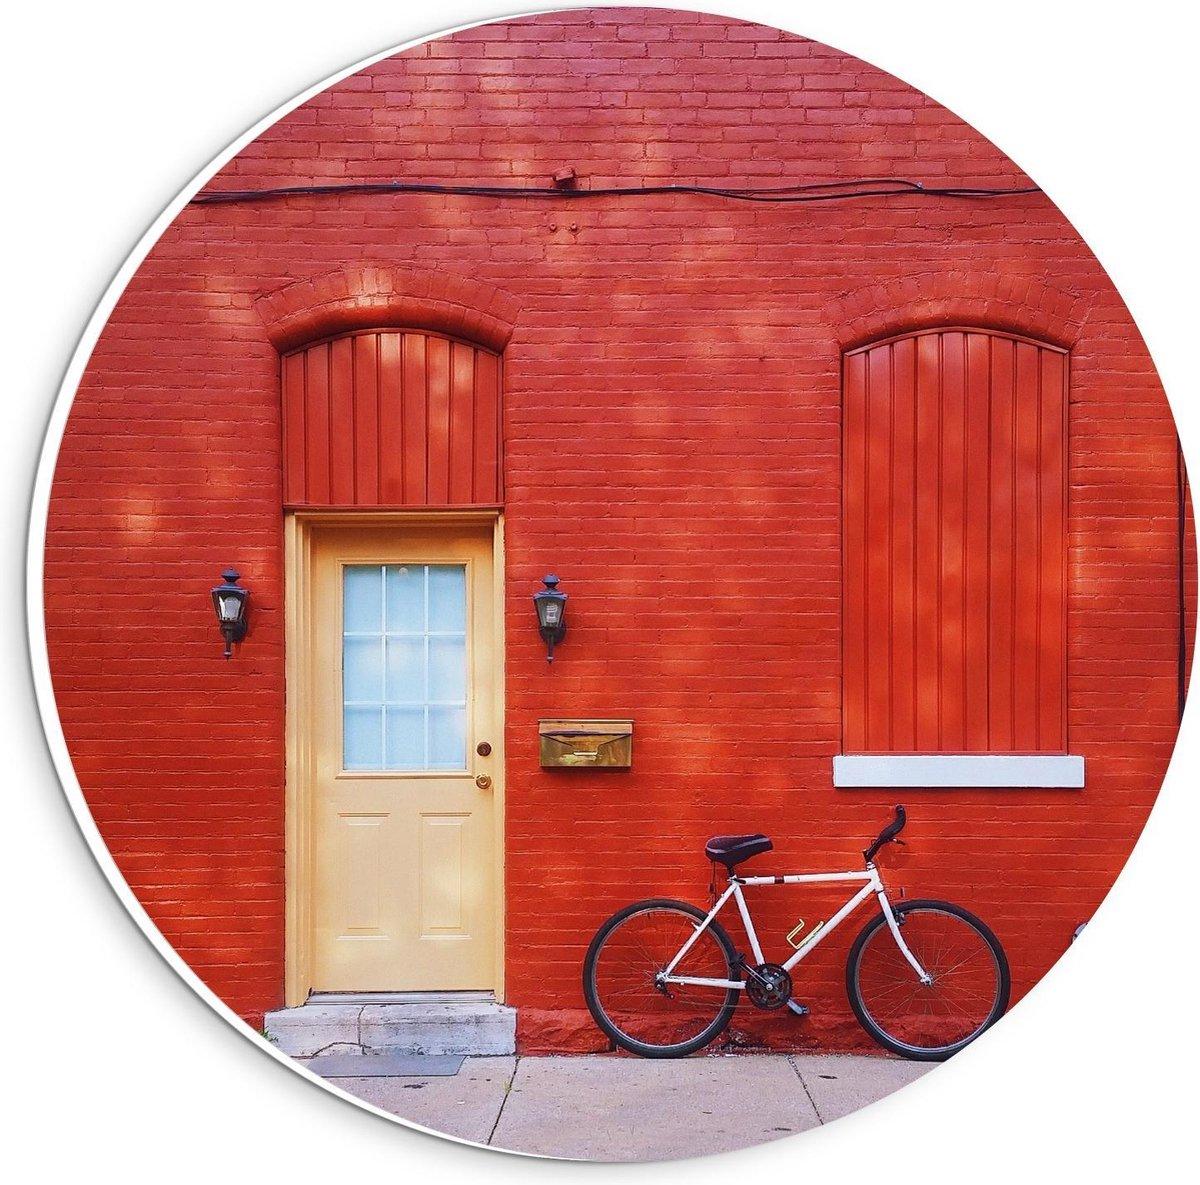 Forex Wandcirkel - Rood Huis met Gele Deur - 20x20cm Foto op Wandcirkel (met ophangsysteem)